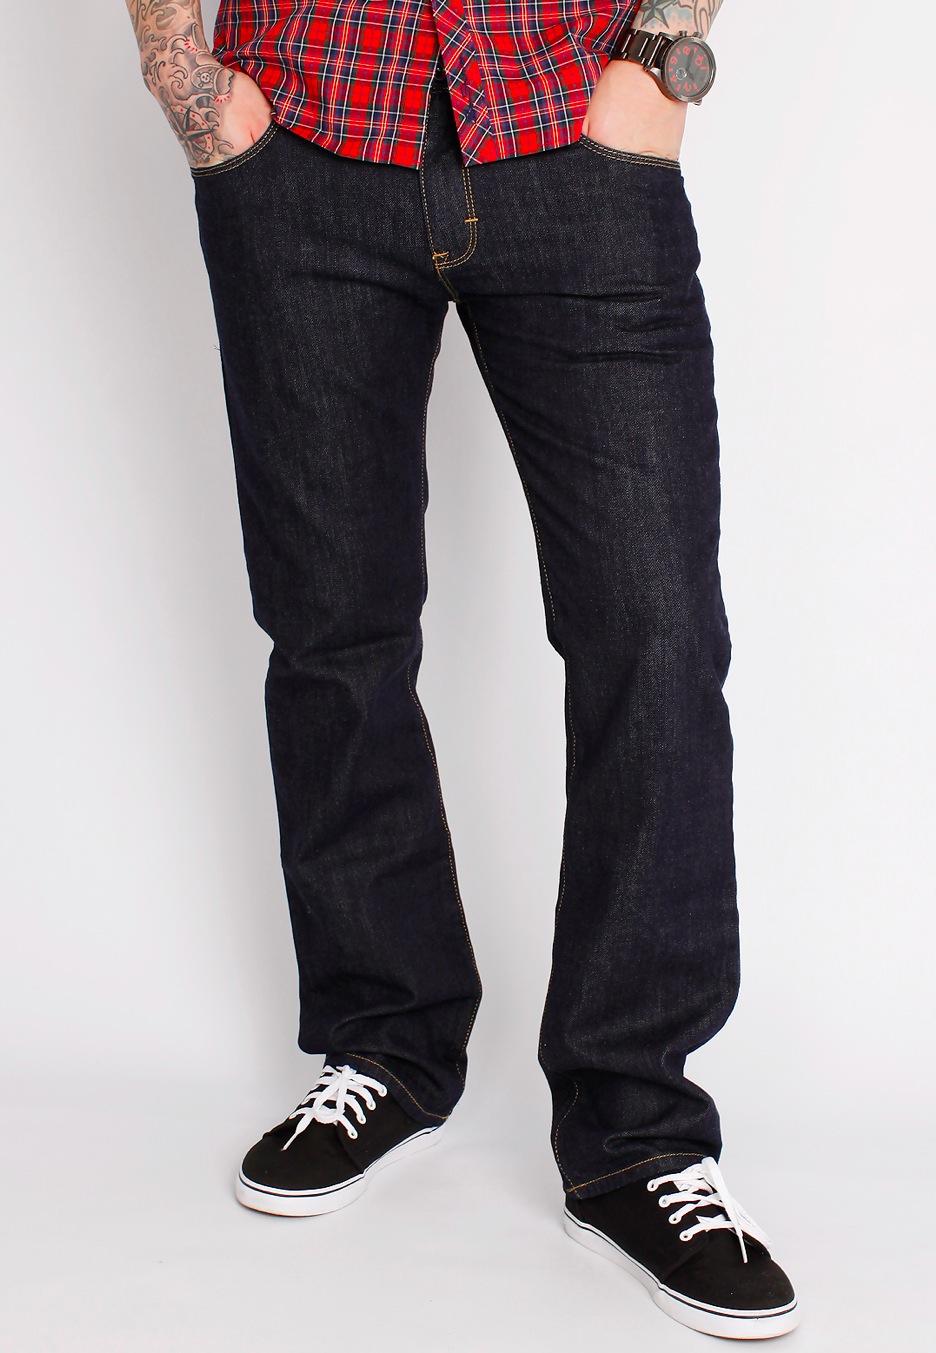 Vans V66 Slim Dark Indigo Jeans Impericon Com De